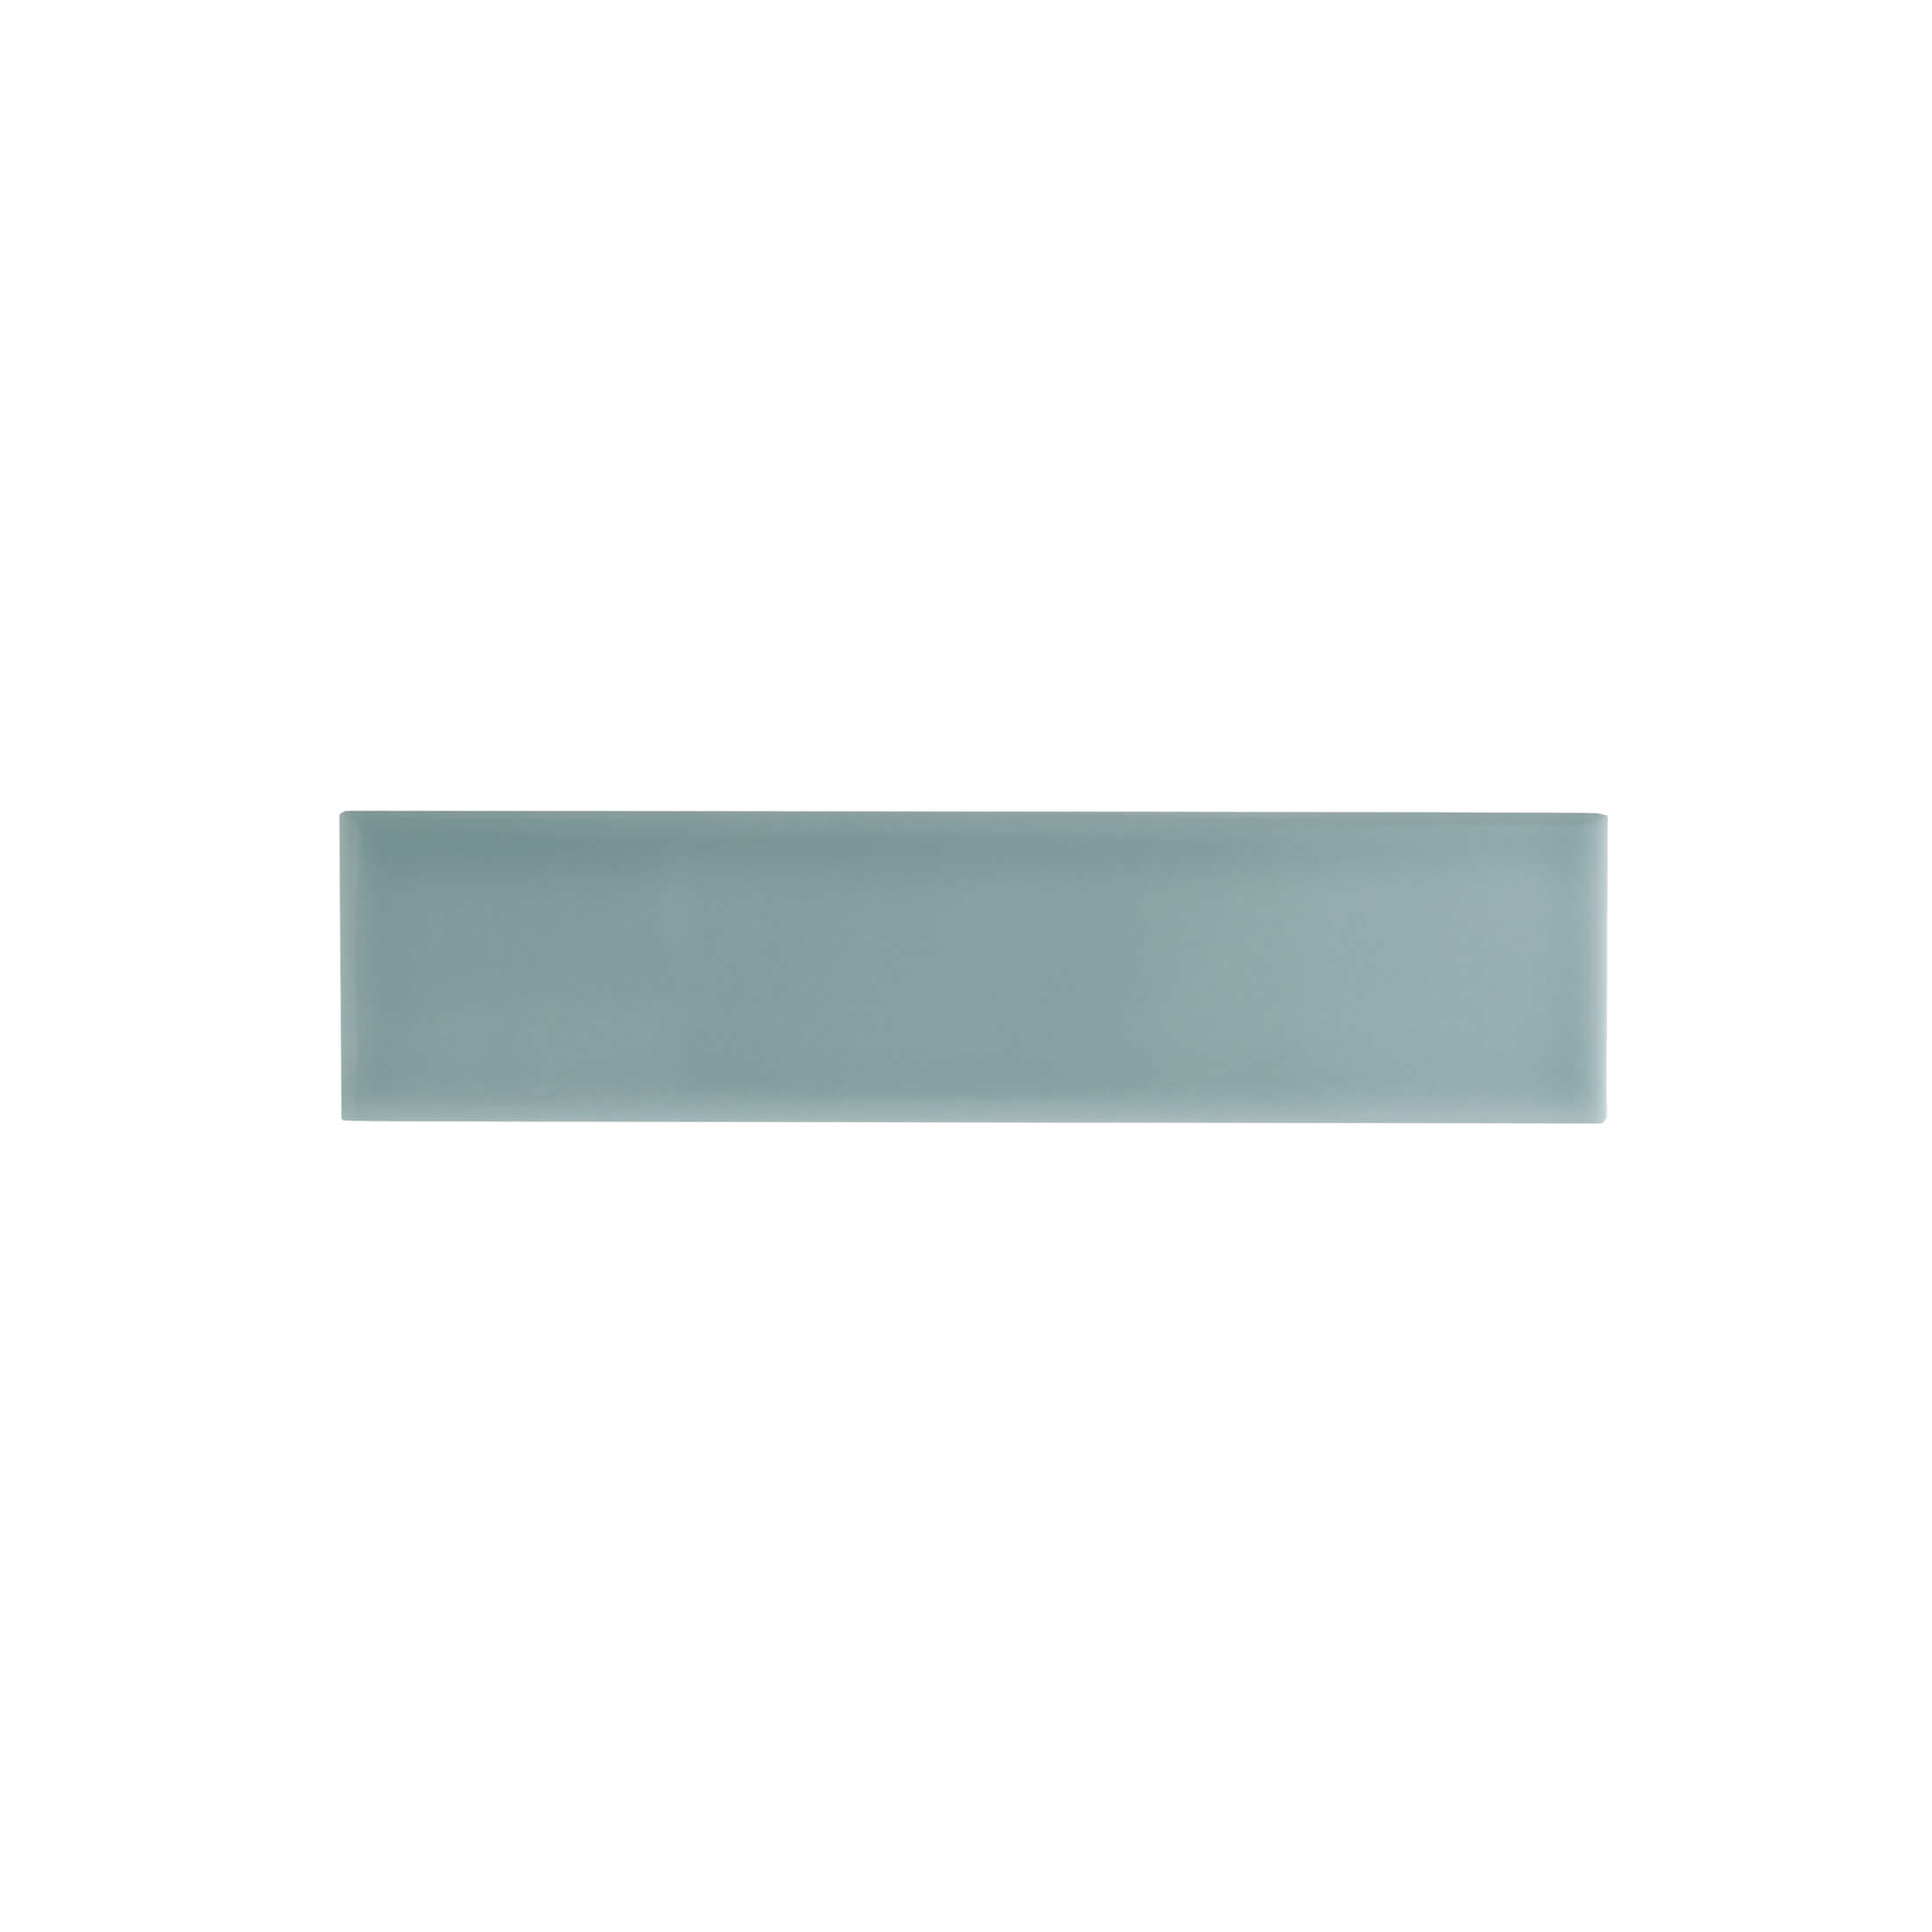 ADNE1102 - LISO PB - 5 cm X 20 cm